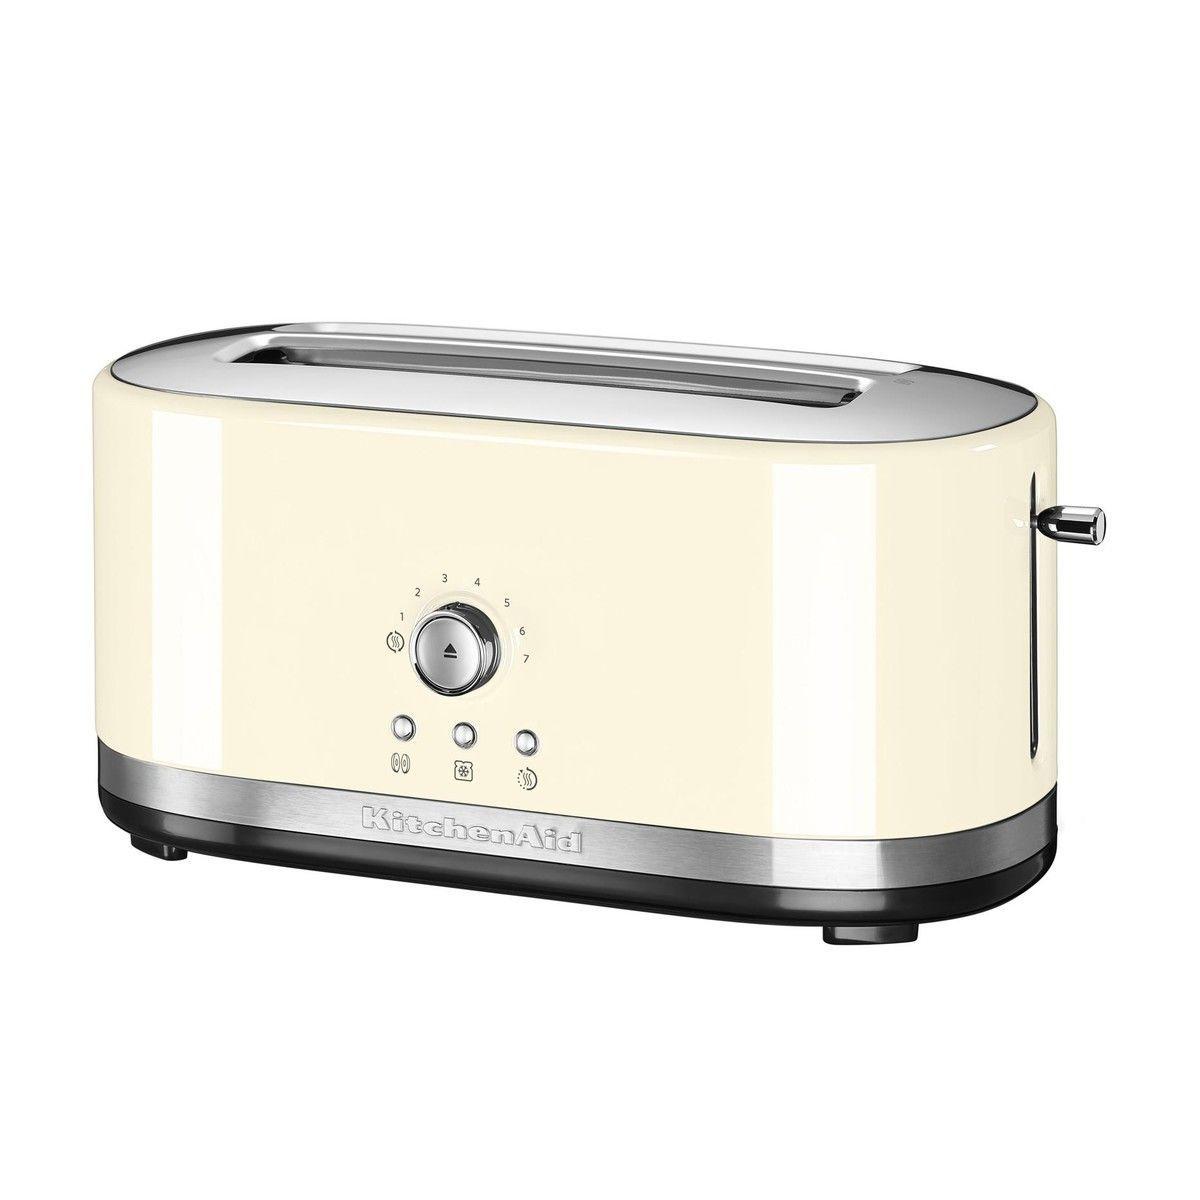 kitchenaid 5kmt4116 manual control toaster kitchenaid. Black Bedroom Furniture Sets. Home Design Ideas